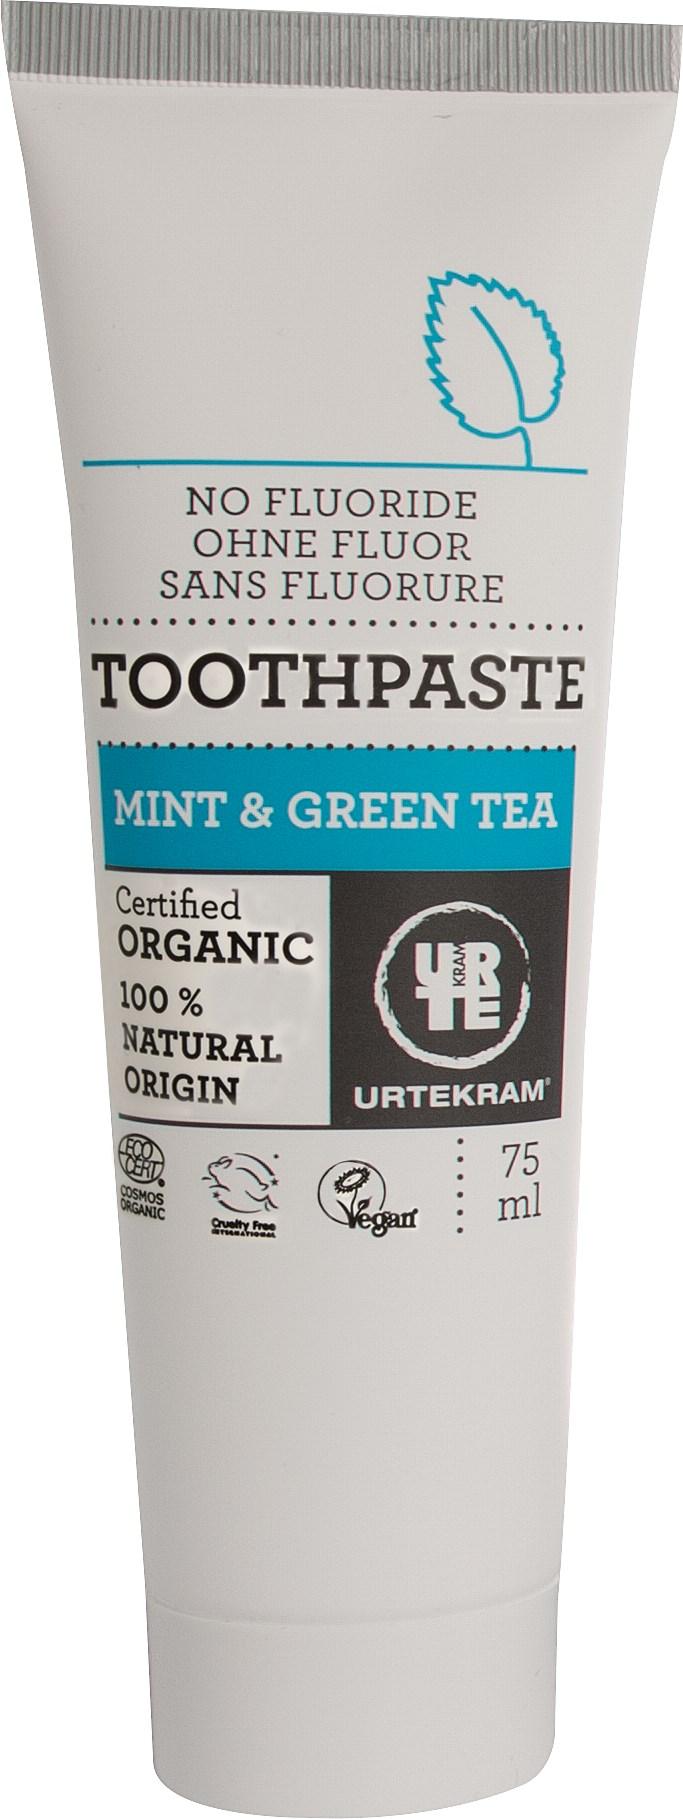 Urtekram Органічна зубна паста Зелений чай/ М'ята. 75 мл - купить в интернет-магазине Юнимед